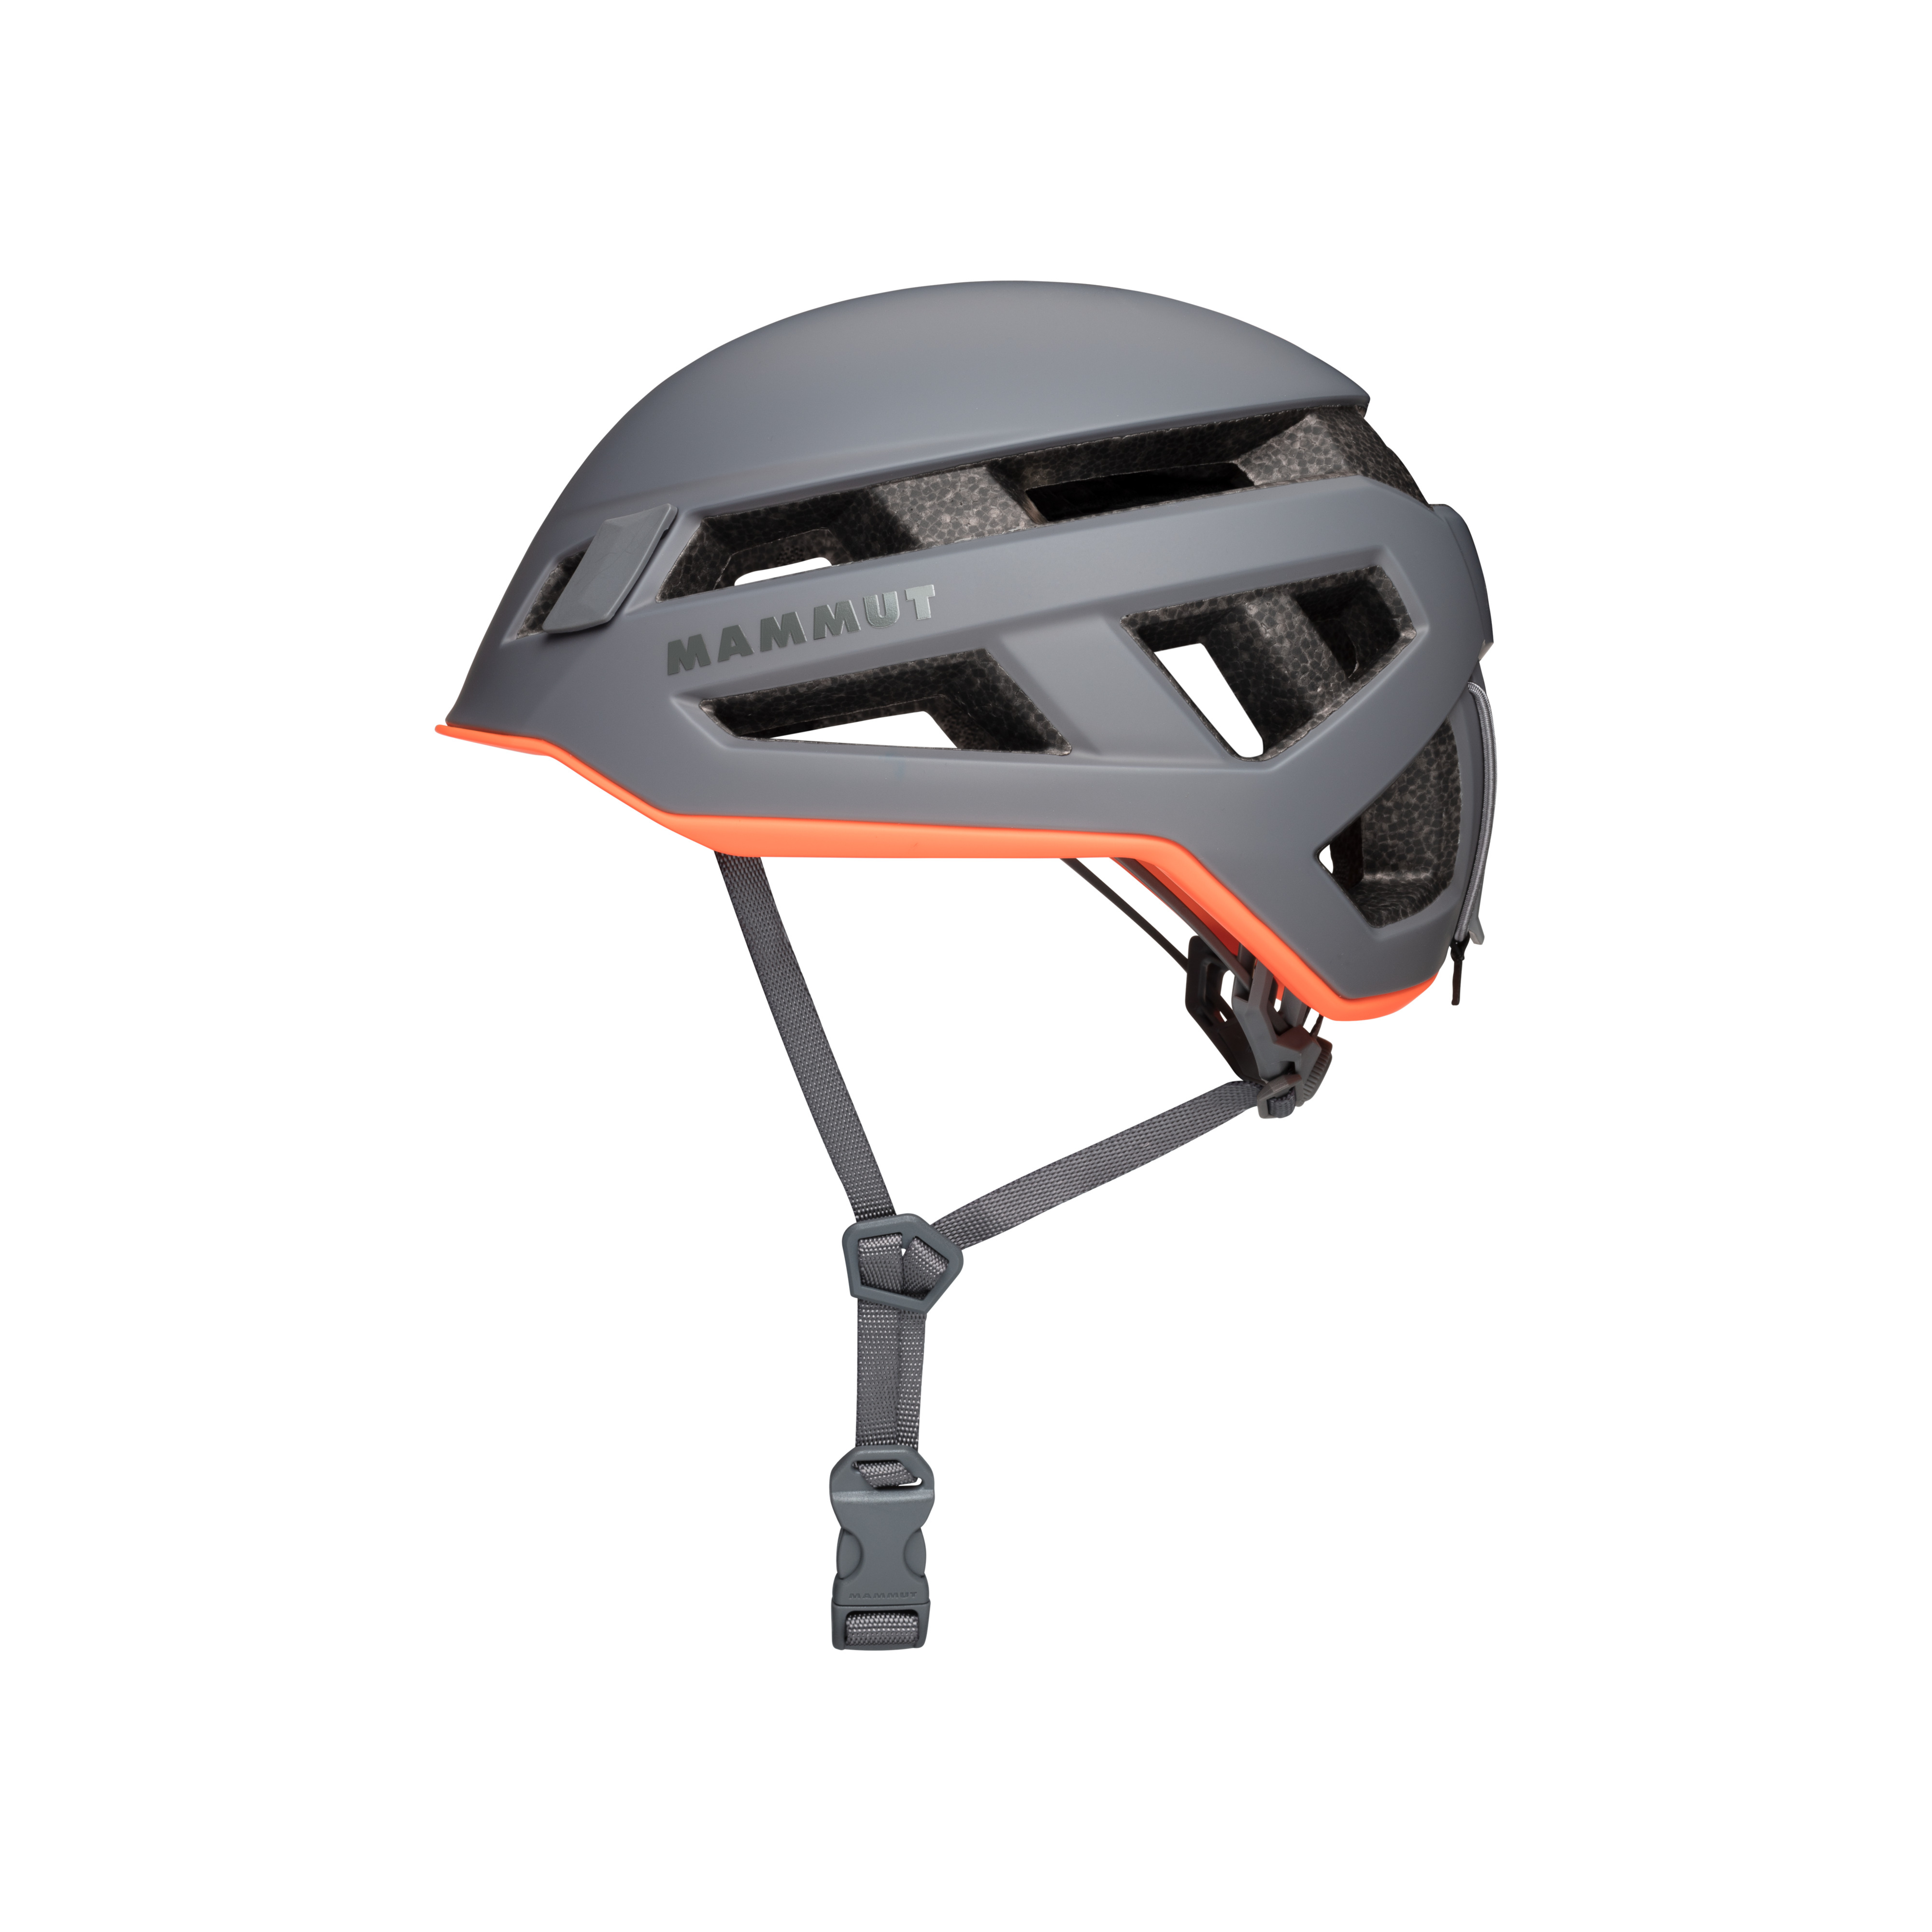 Crag Sender Helmet - 52-57cm, titanium thumbnail